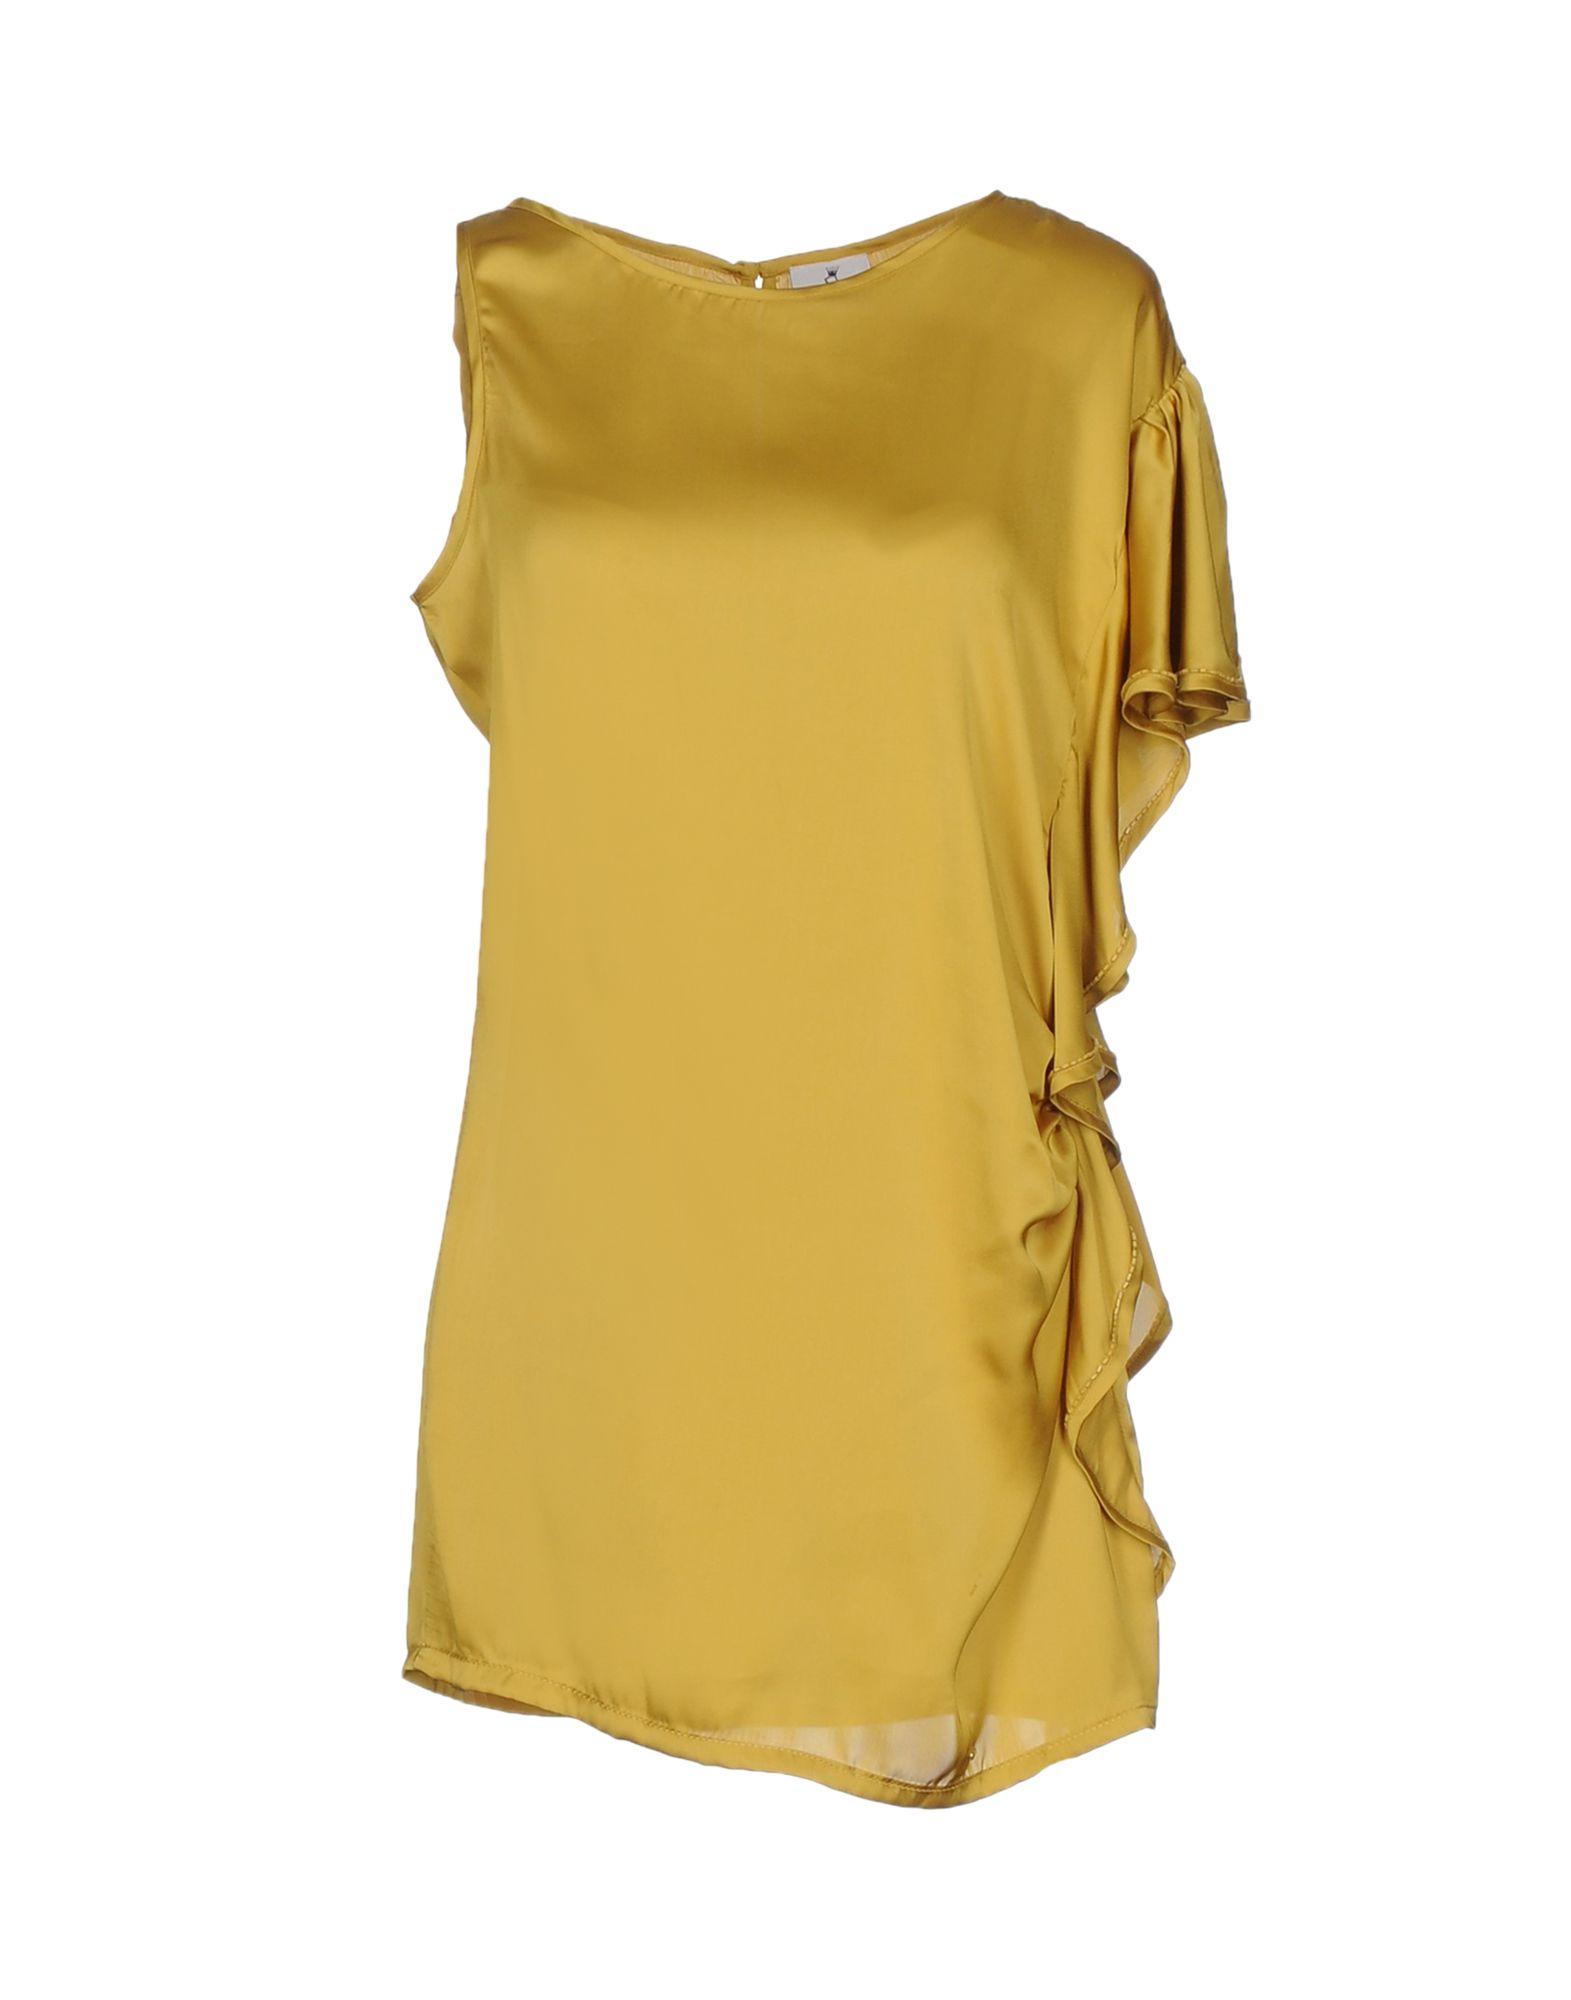 где купить ONLY 4 STYLISH GIRLS by PATRIZIA PEPE Короткое платье по лучшей цене